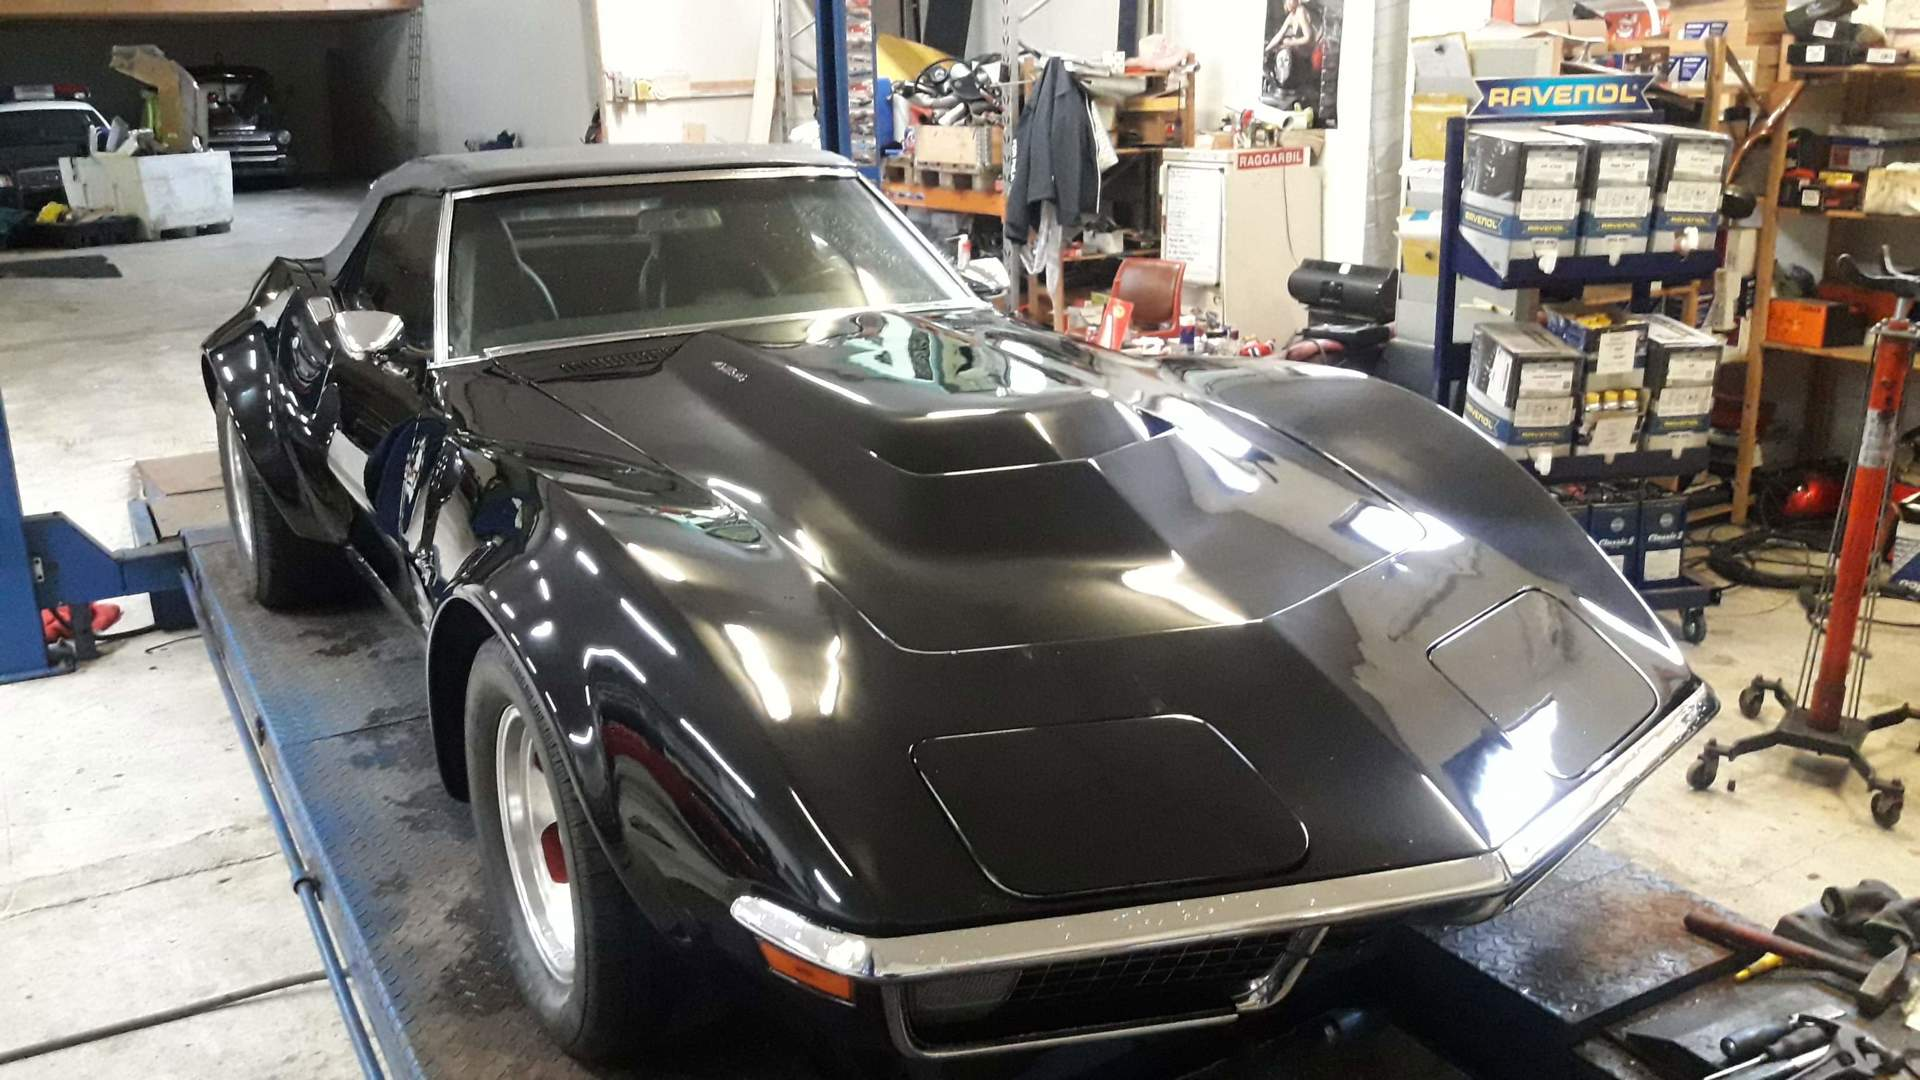 270-1971 Chevrolet Corvette Stingray convertible 0